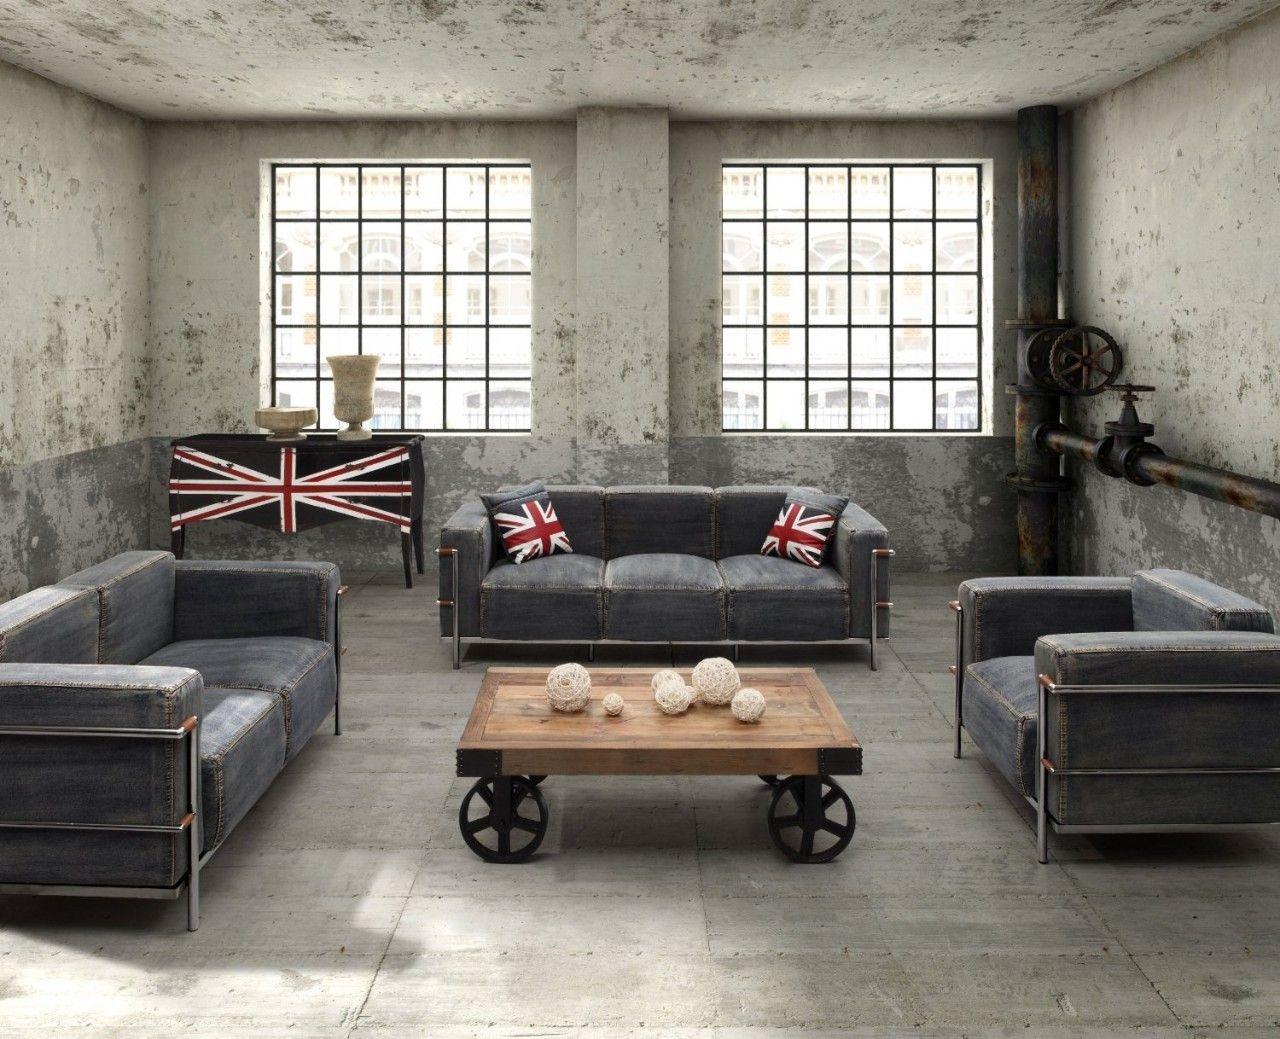 Colins Blue Denim Seating: Sleeper/Storage Sectional, Sofa, Loveseat, Chair, Egg Chaur | Zin Home